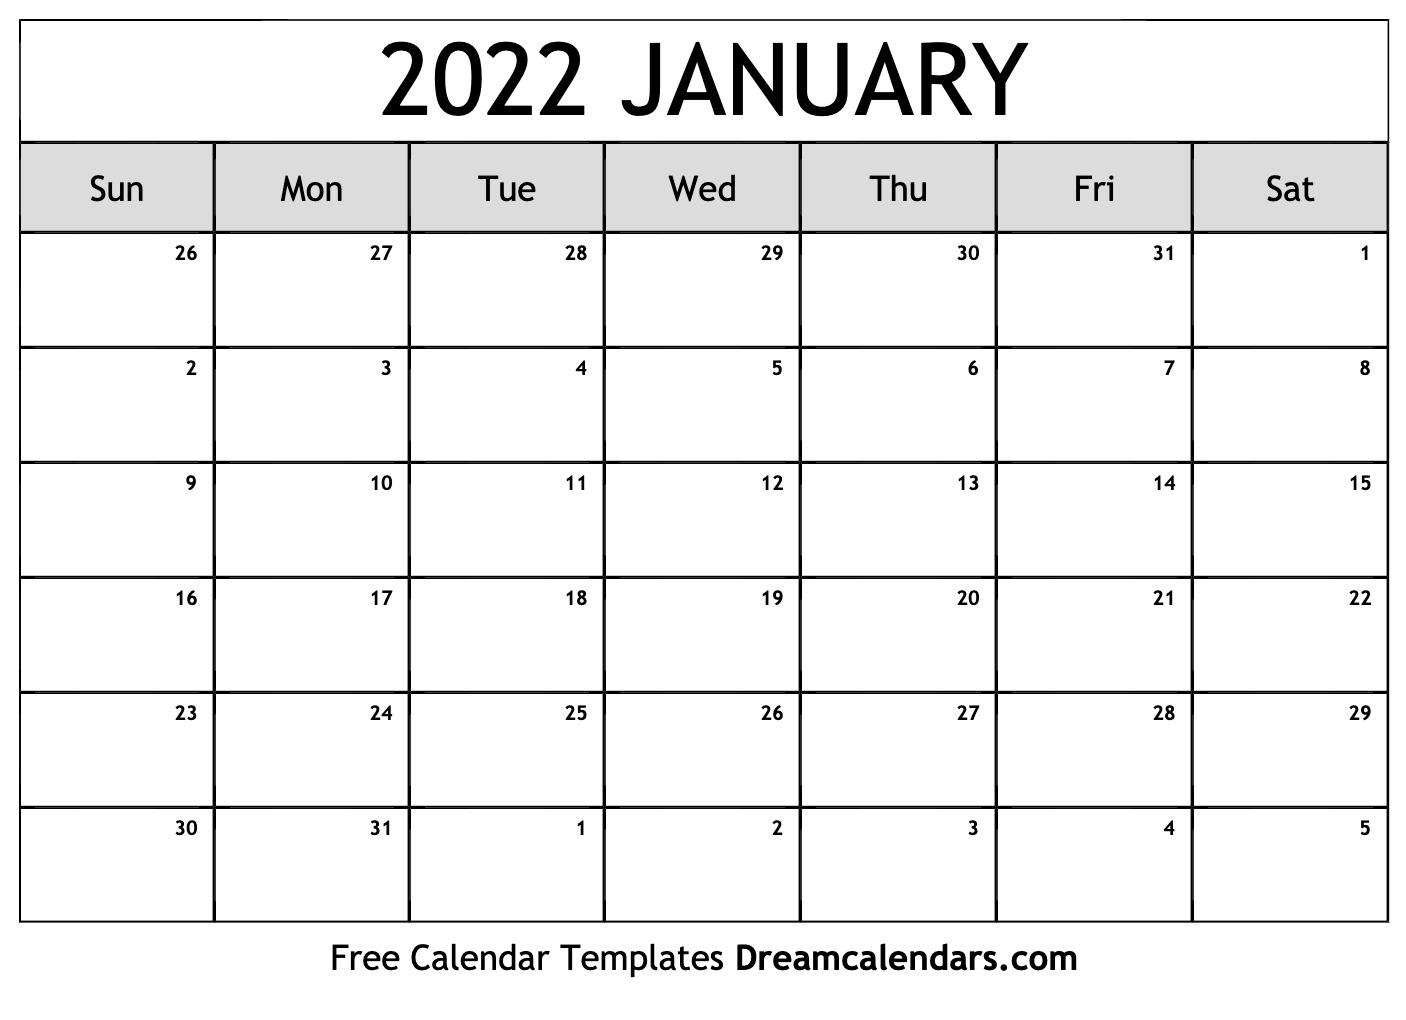 January 2022 Calendar   Free Blank Printable Templates With Regard To Images Of January 2022 Calendar